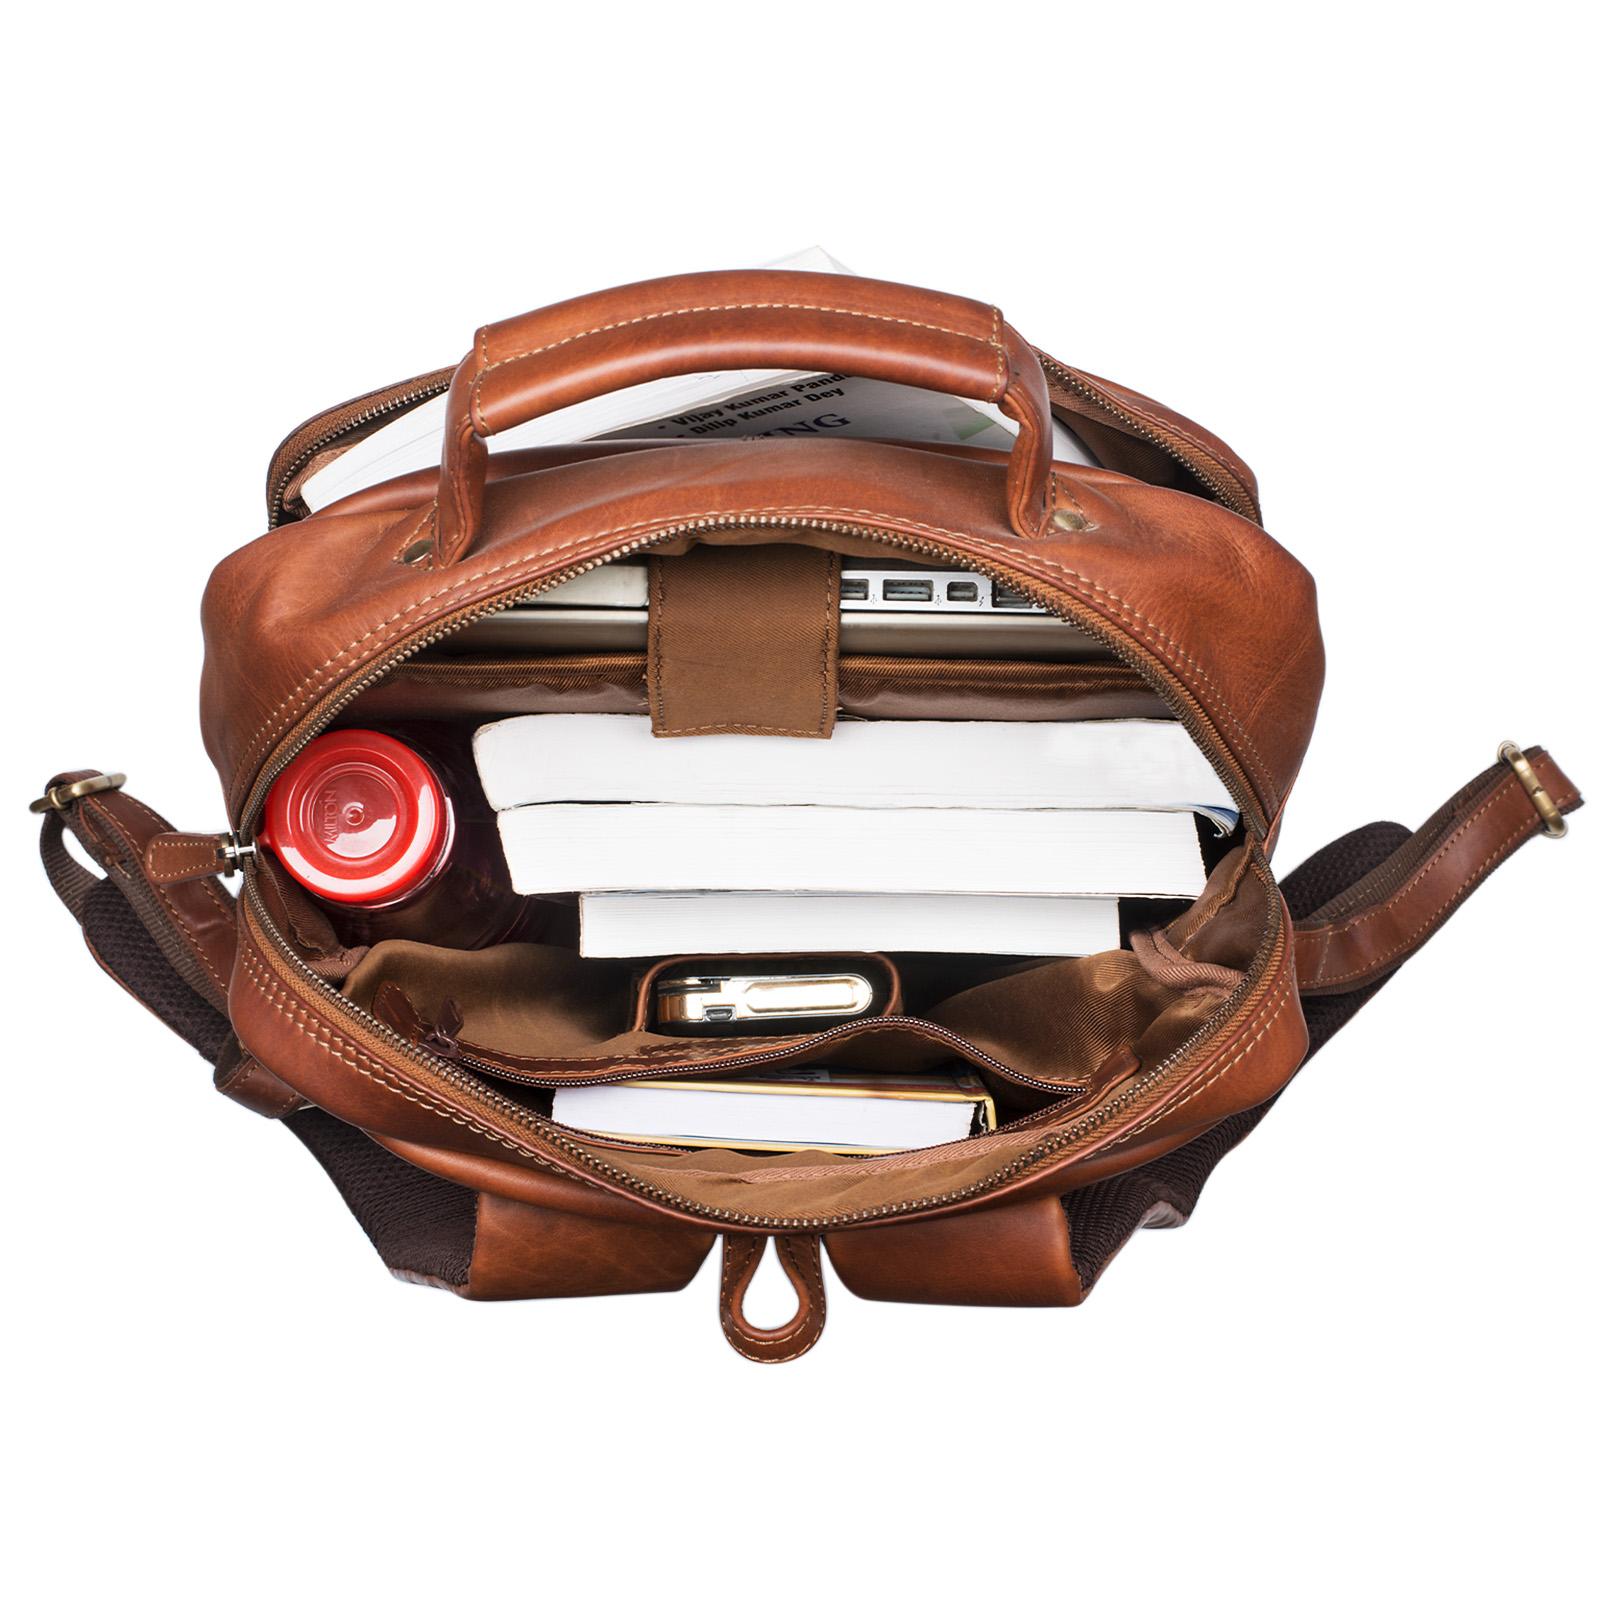 Rucksackhandtasche modern Leder braun